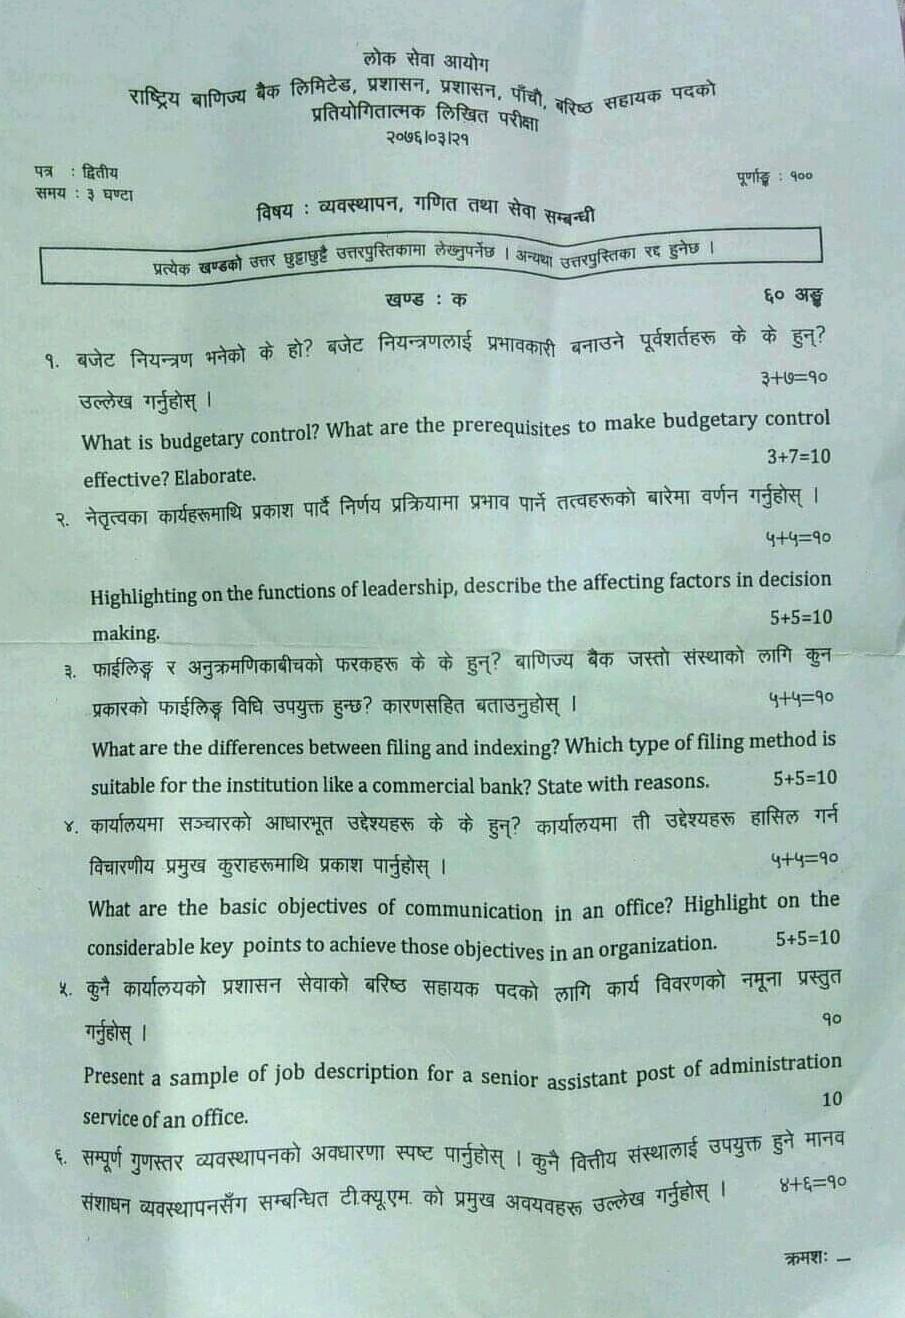 Rastriya Banijya Bank | Sr. Assistant Level 5 | Second Paper Question 2076/3/21